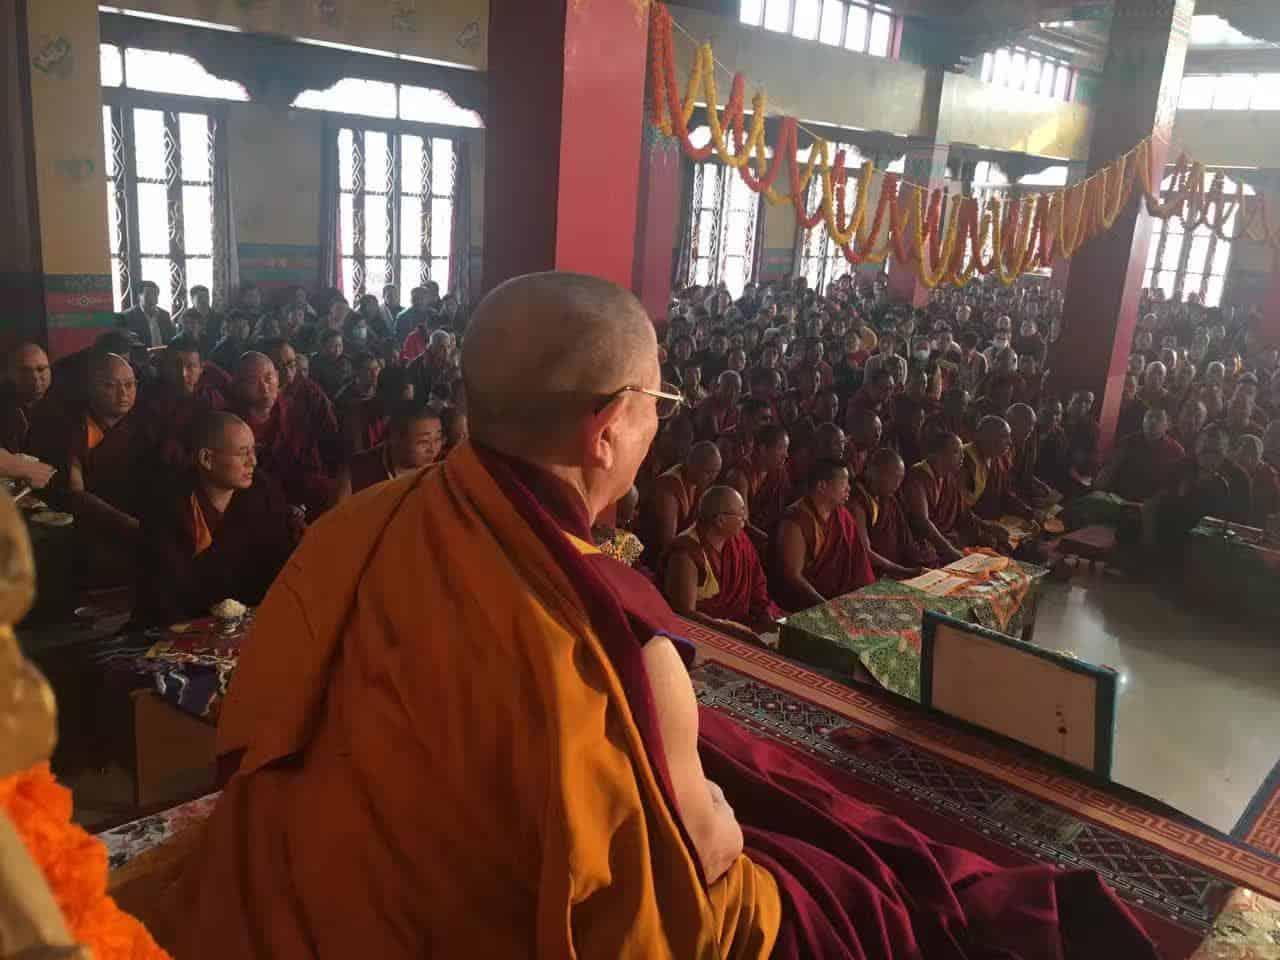 Gosok Rinpoche India 2017 longlife 0eda6901bc8a41b91dad71167882fed